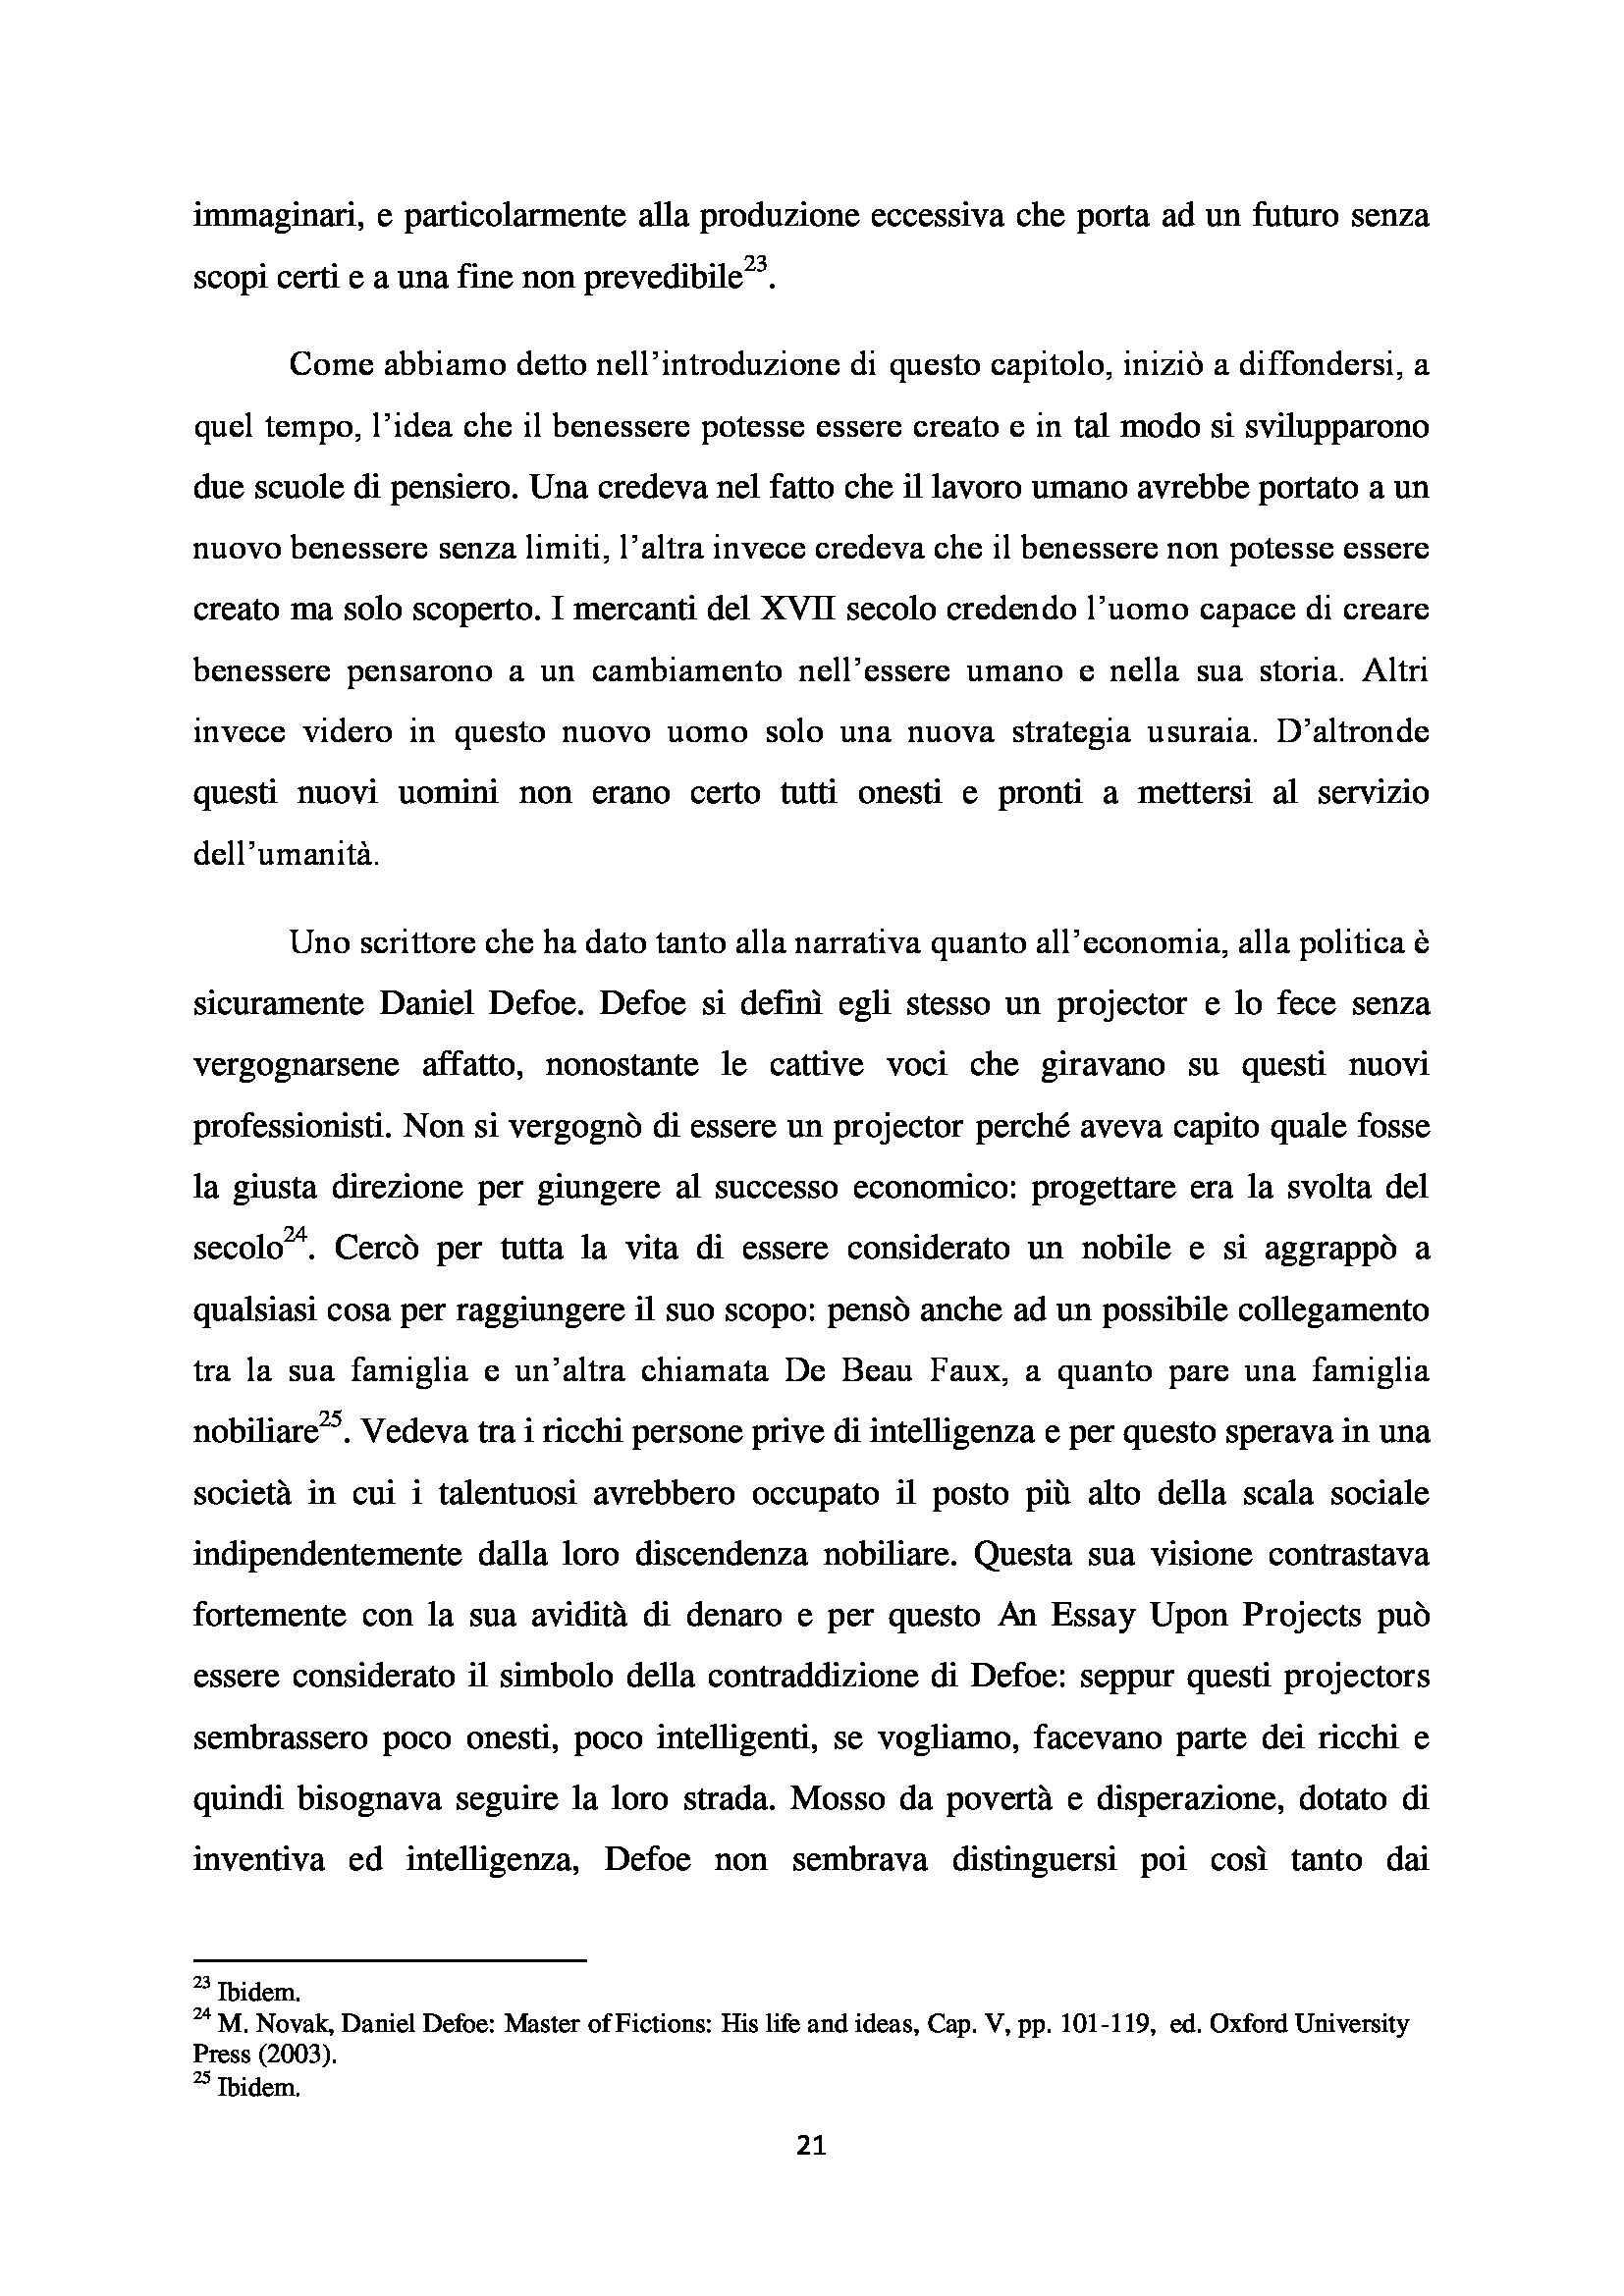 Tesi - A Modest Proposal Jonathan Swift Pag. 21